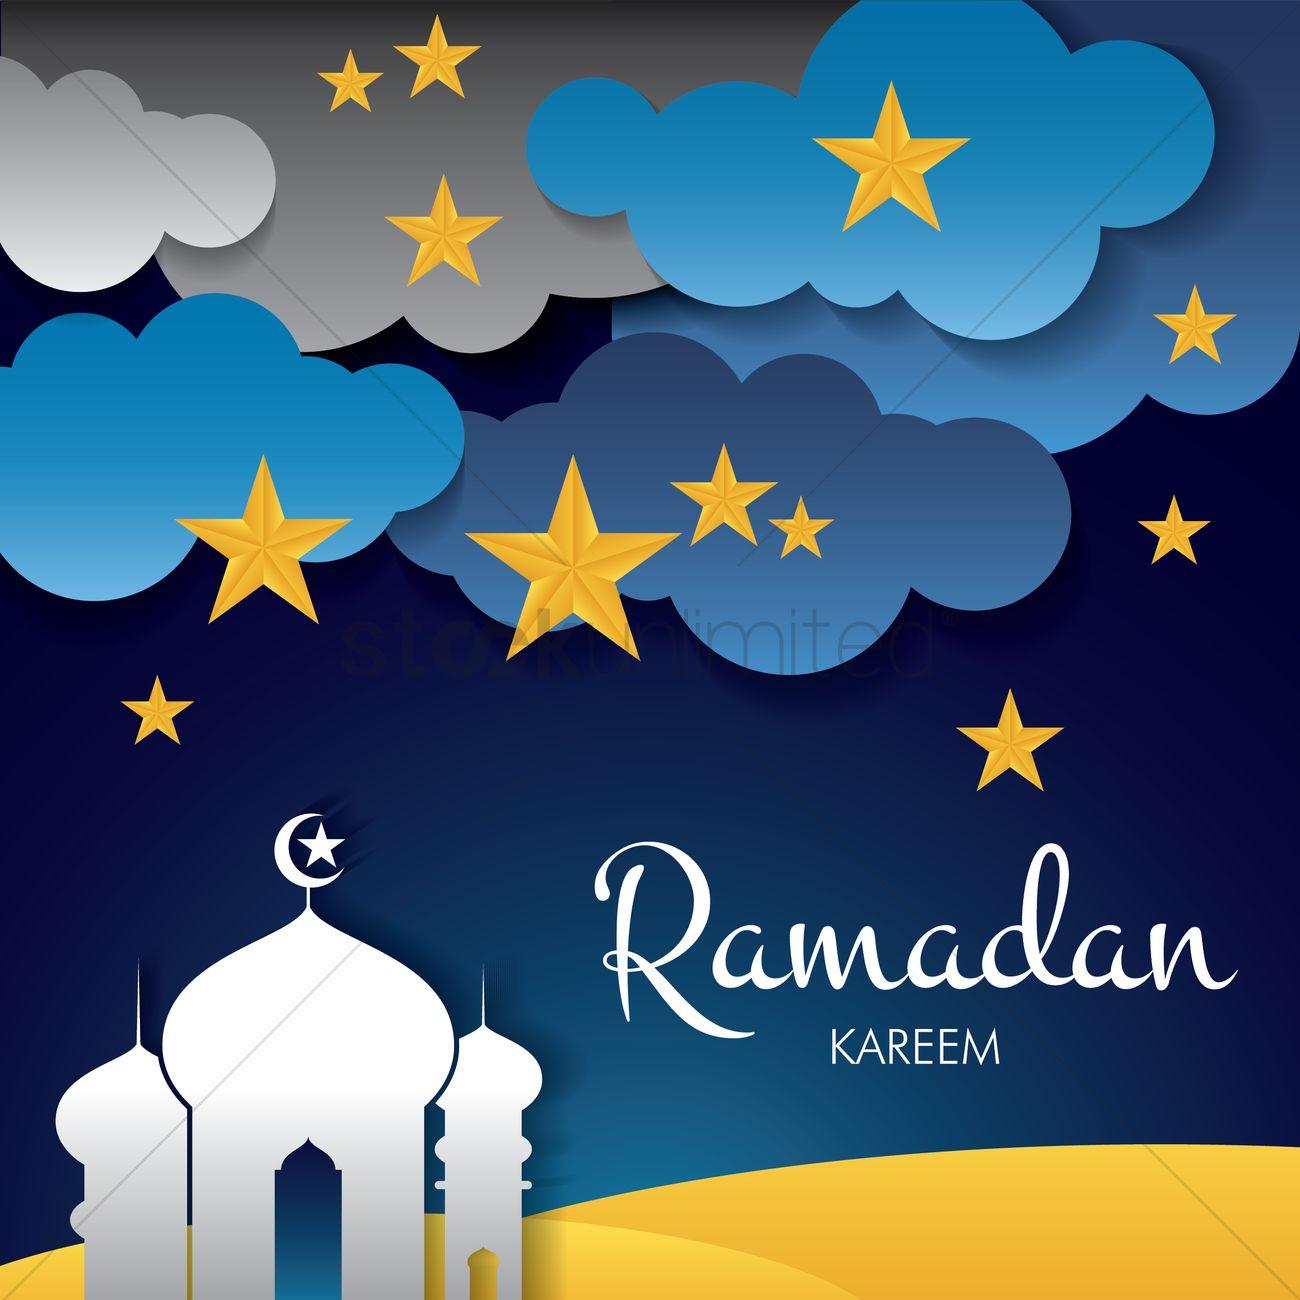 Ramadan Kareem Greeting Vector Image 1827853 Stockunlimited